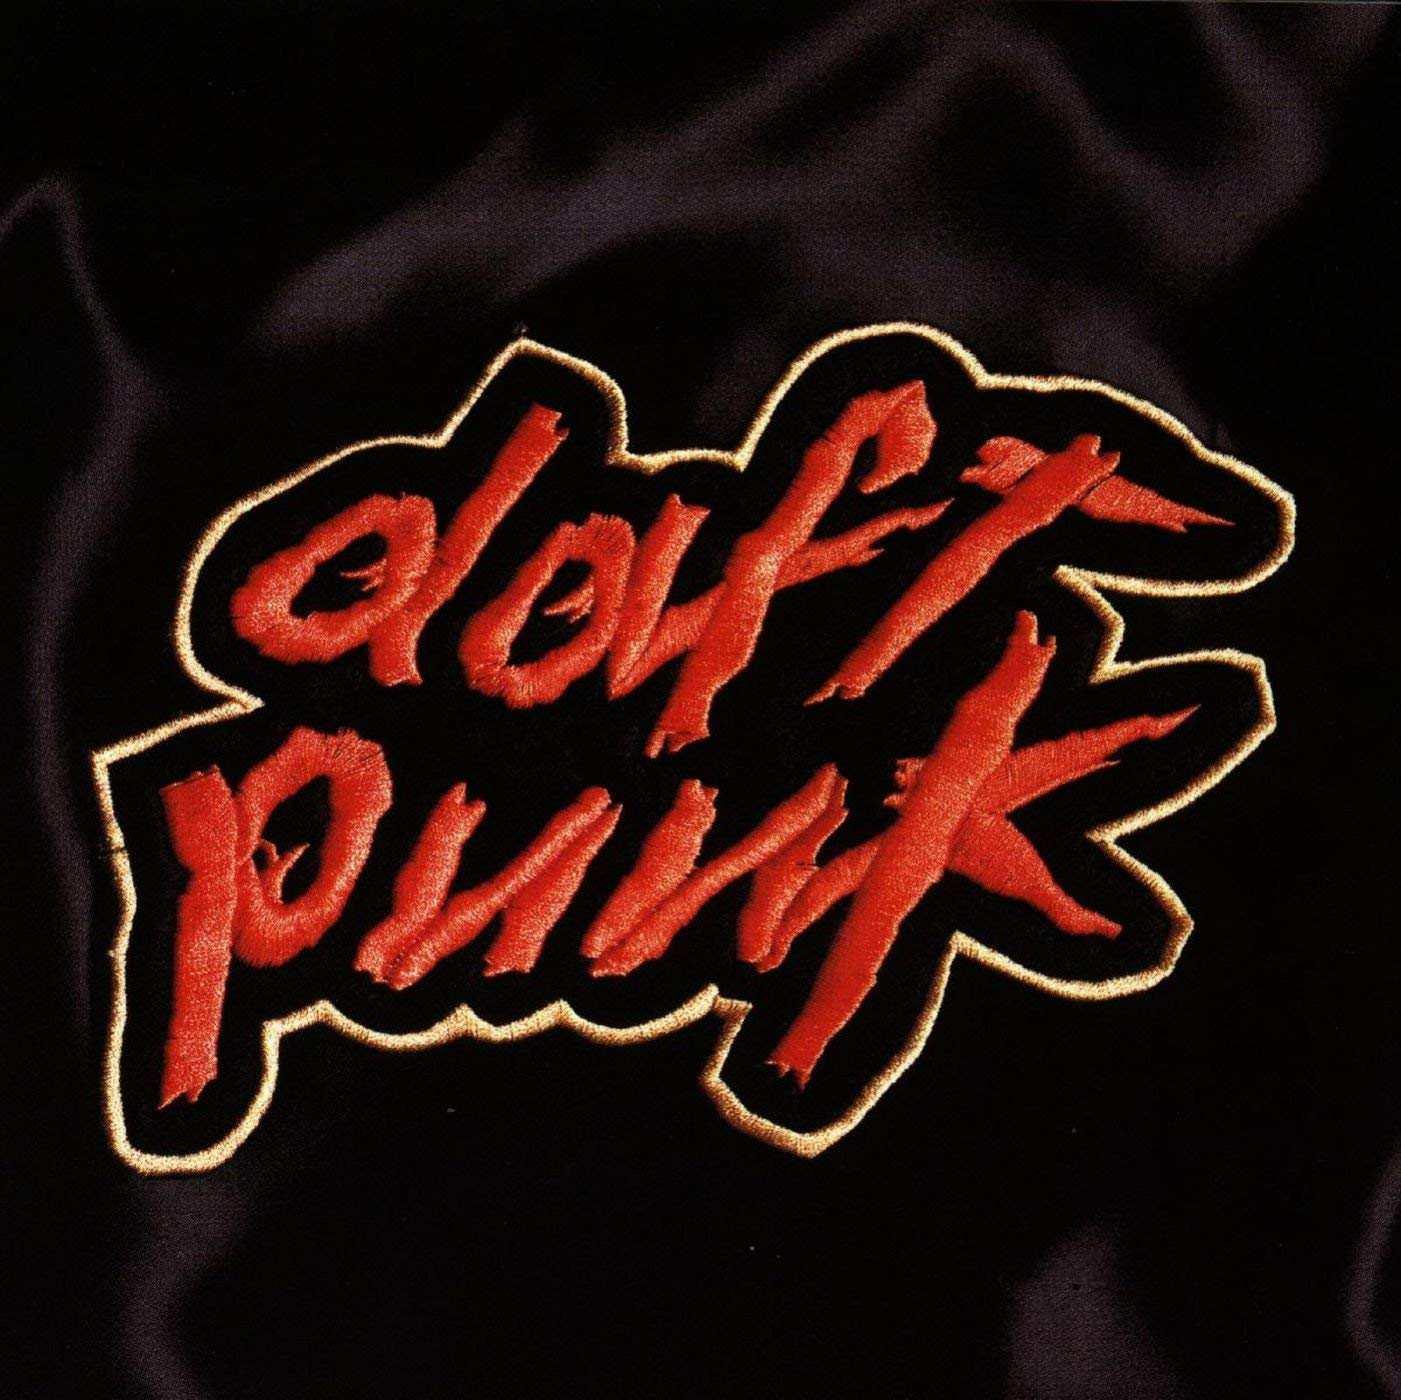 Daft Punk logo embroidered on black silk fabric.